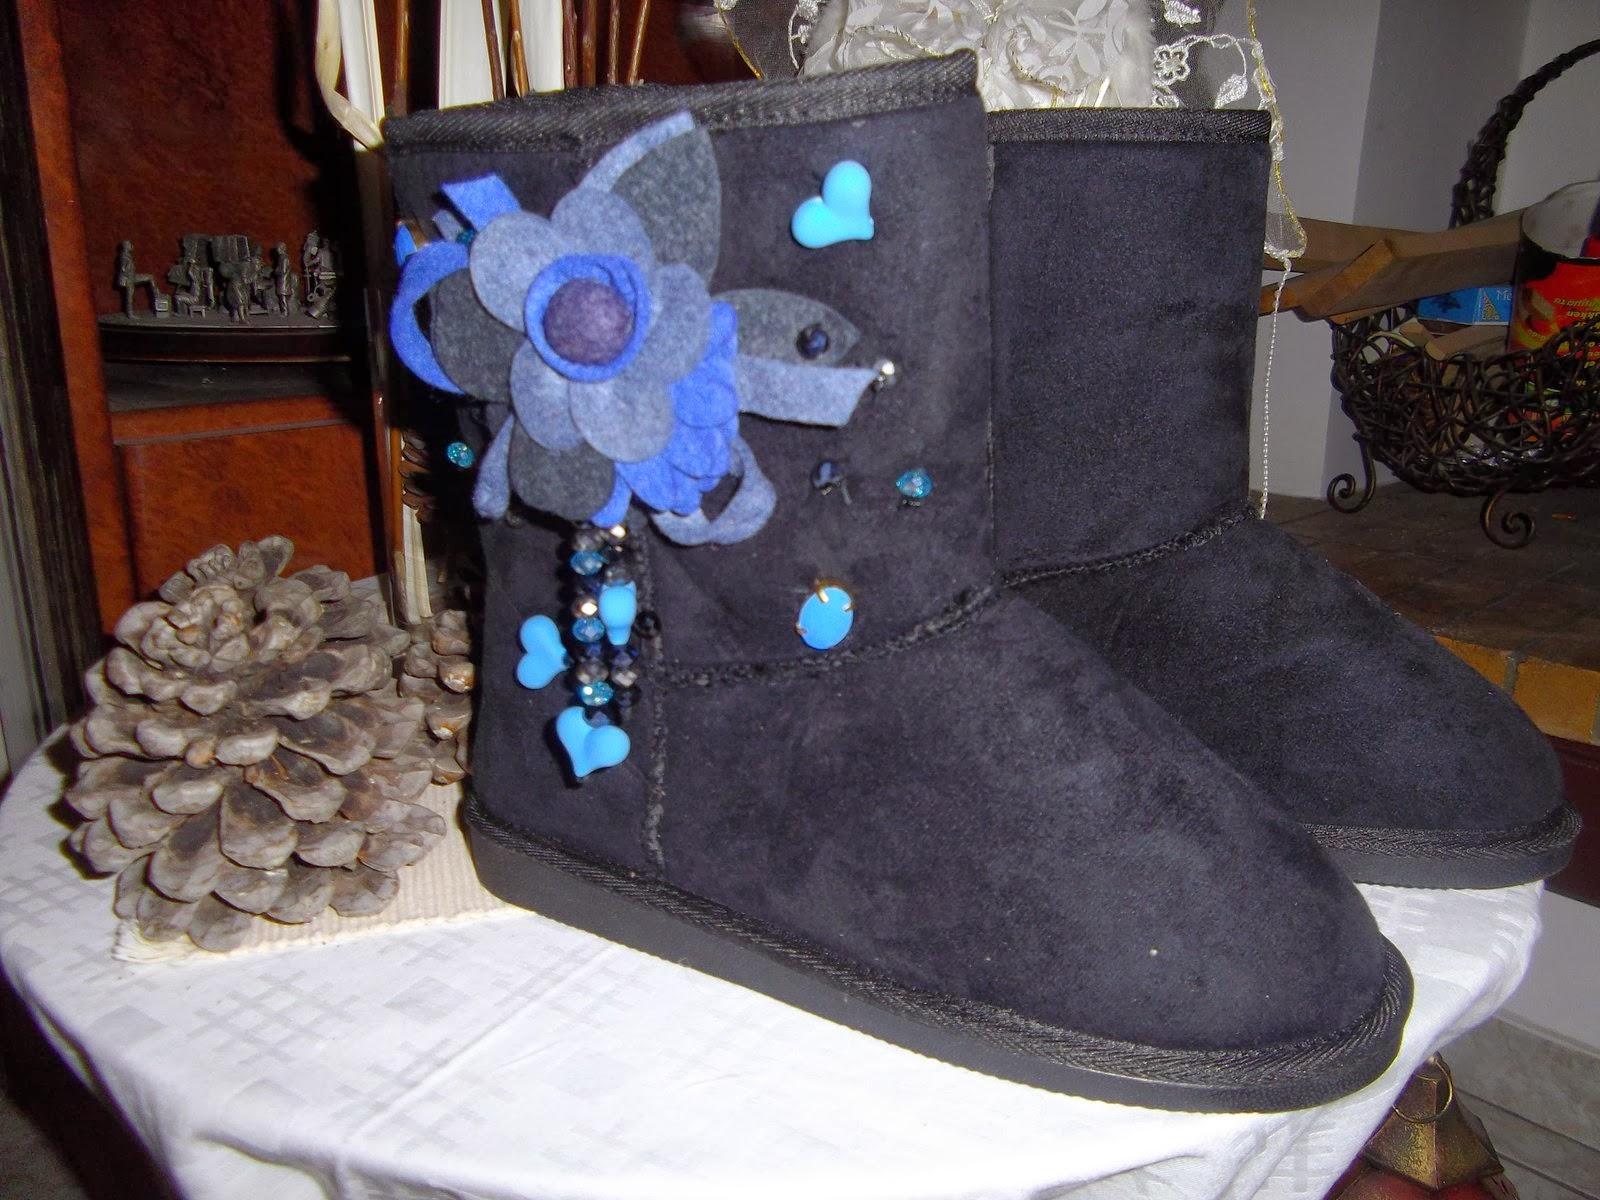 161f27f0c5d Γυναικείες μπότες τύπου Ugg, διακοσμημένες κατά παραγγελία. Διαθέσιμες και  σε άλλα χρώματα και φυσικά διακοσμημένες και με την διακόσμηση της επιλογής  σας. ...